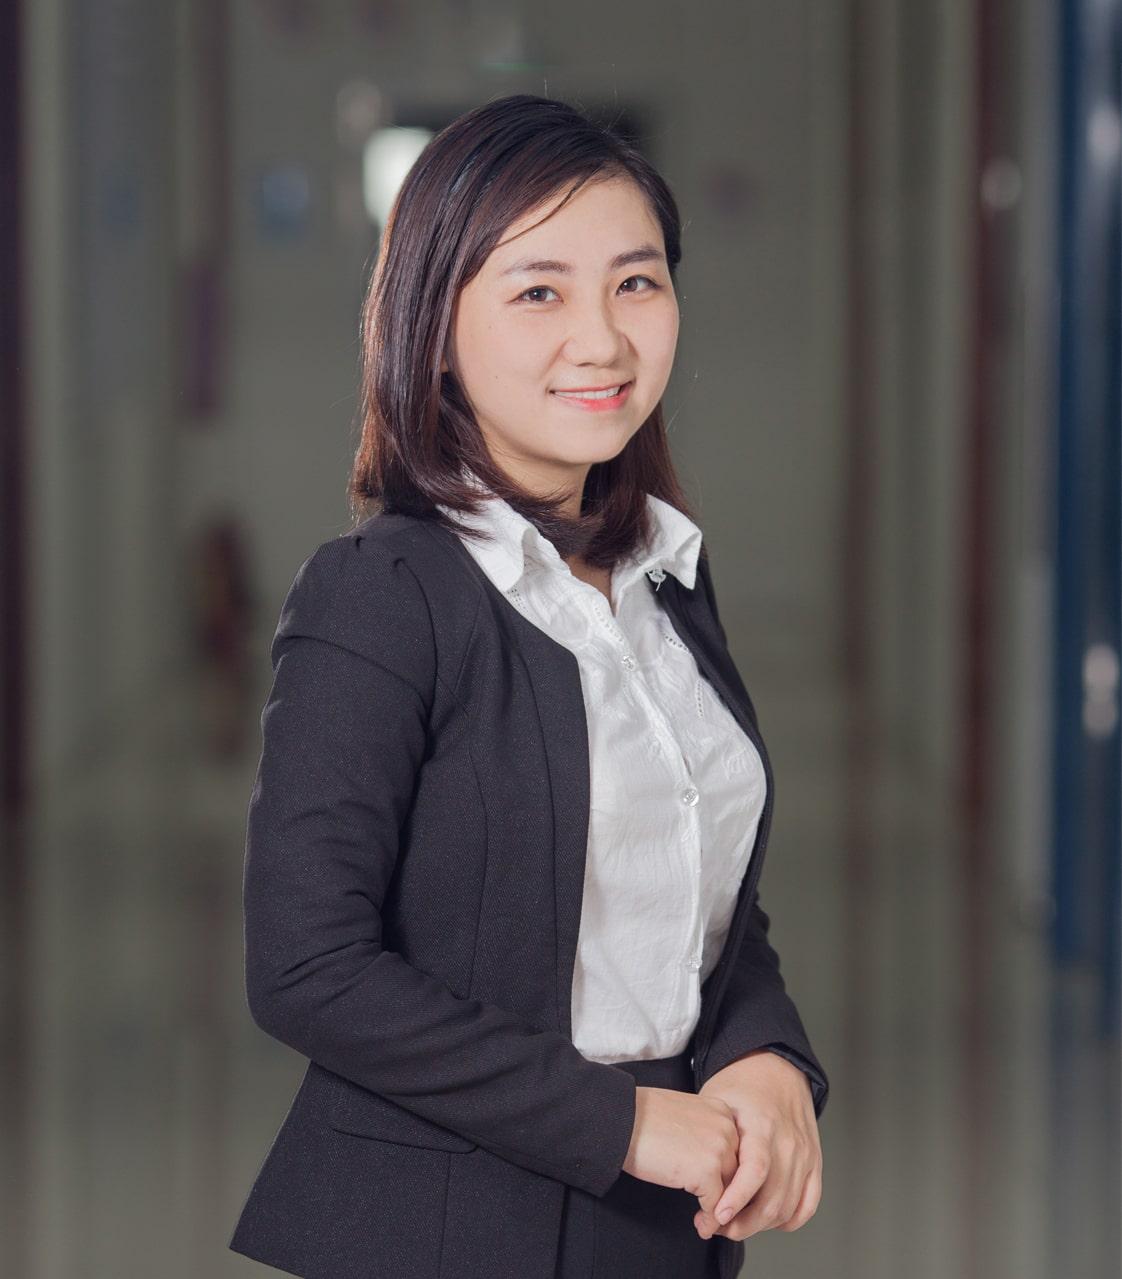 Ms. Vu Thi Ngoc Hoa (Flower)